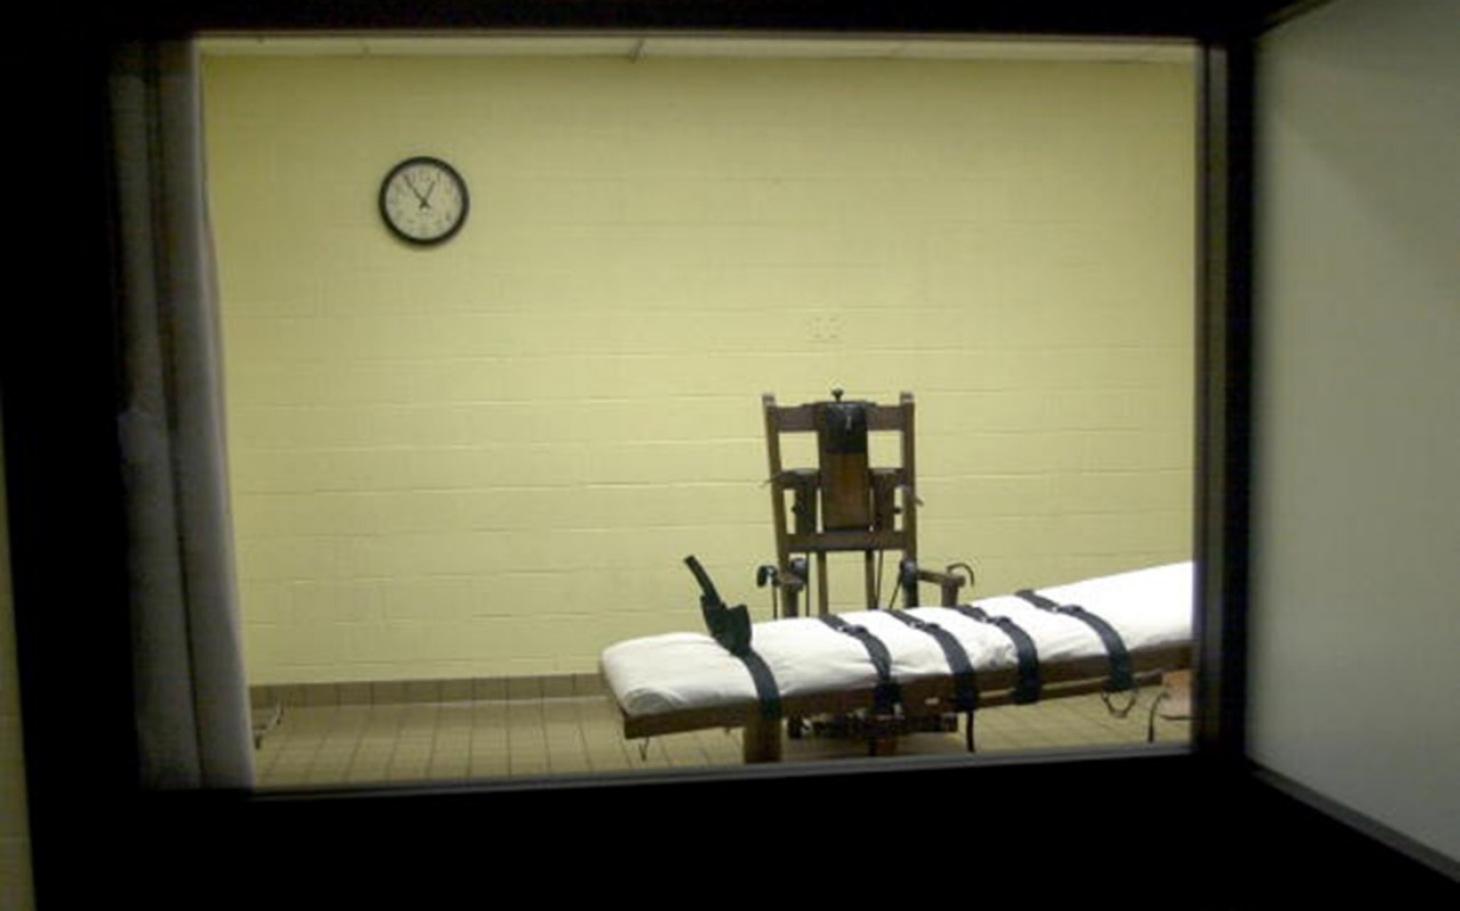 & Florida Inmate asks Execution by Electric Chair | Al Jazeera America